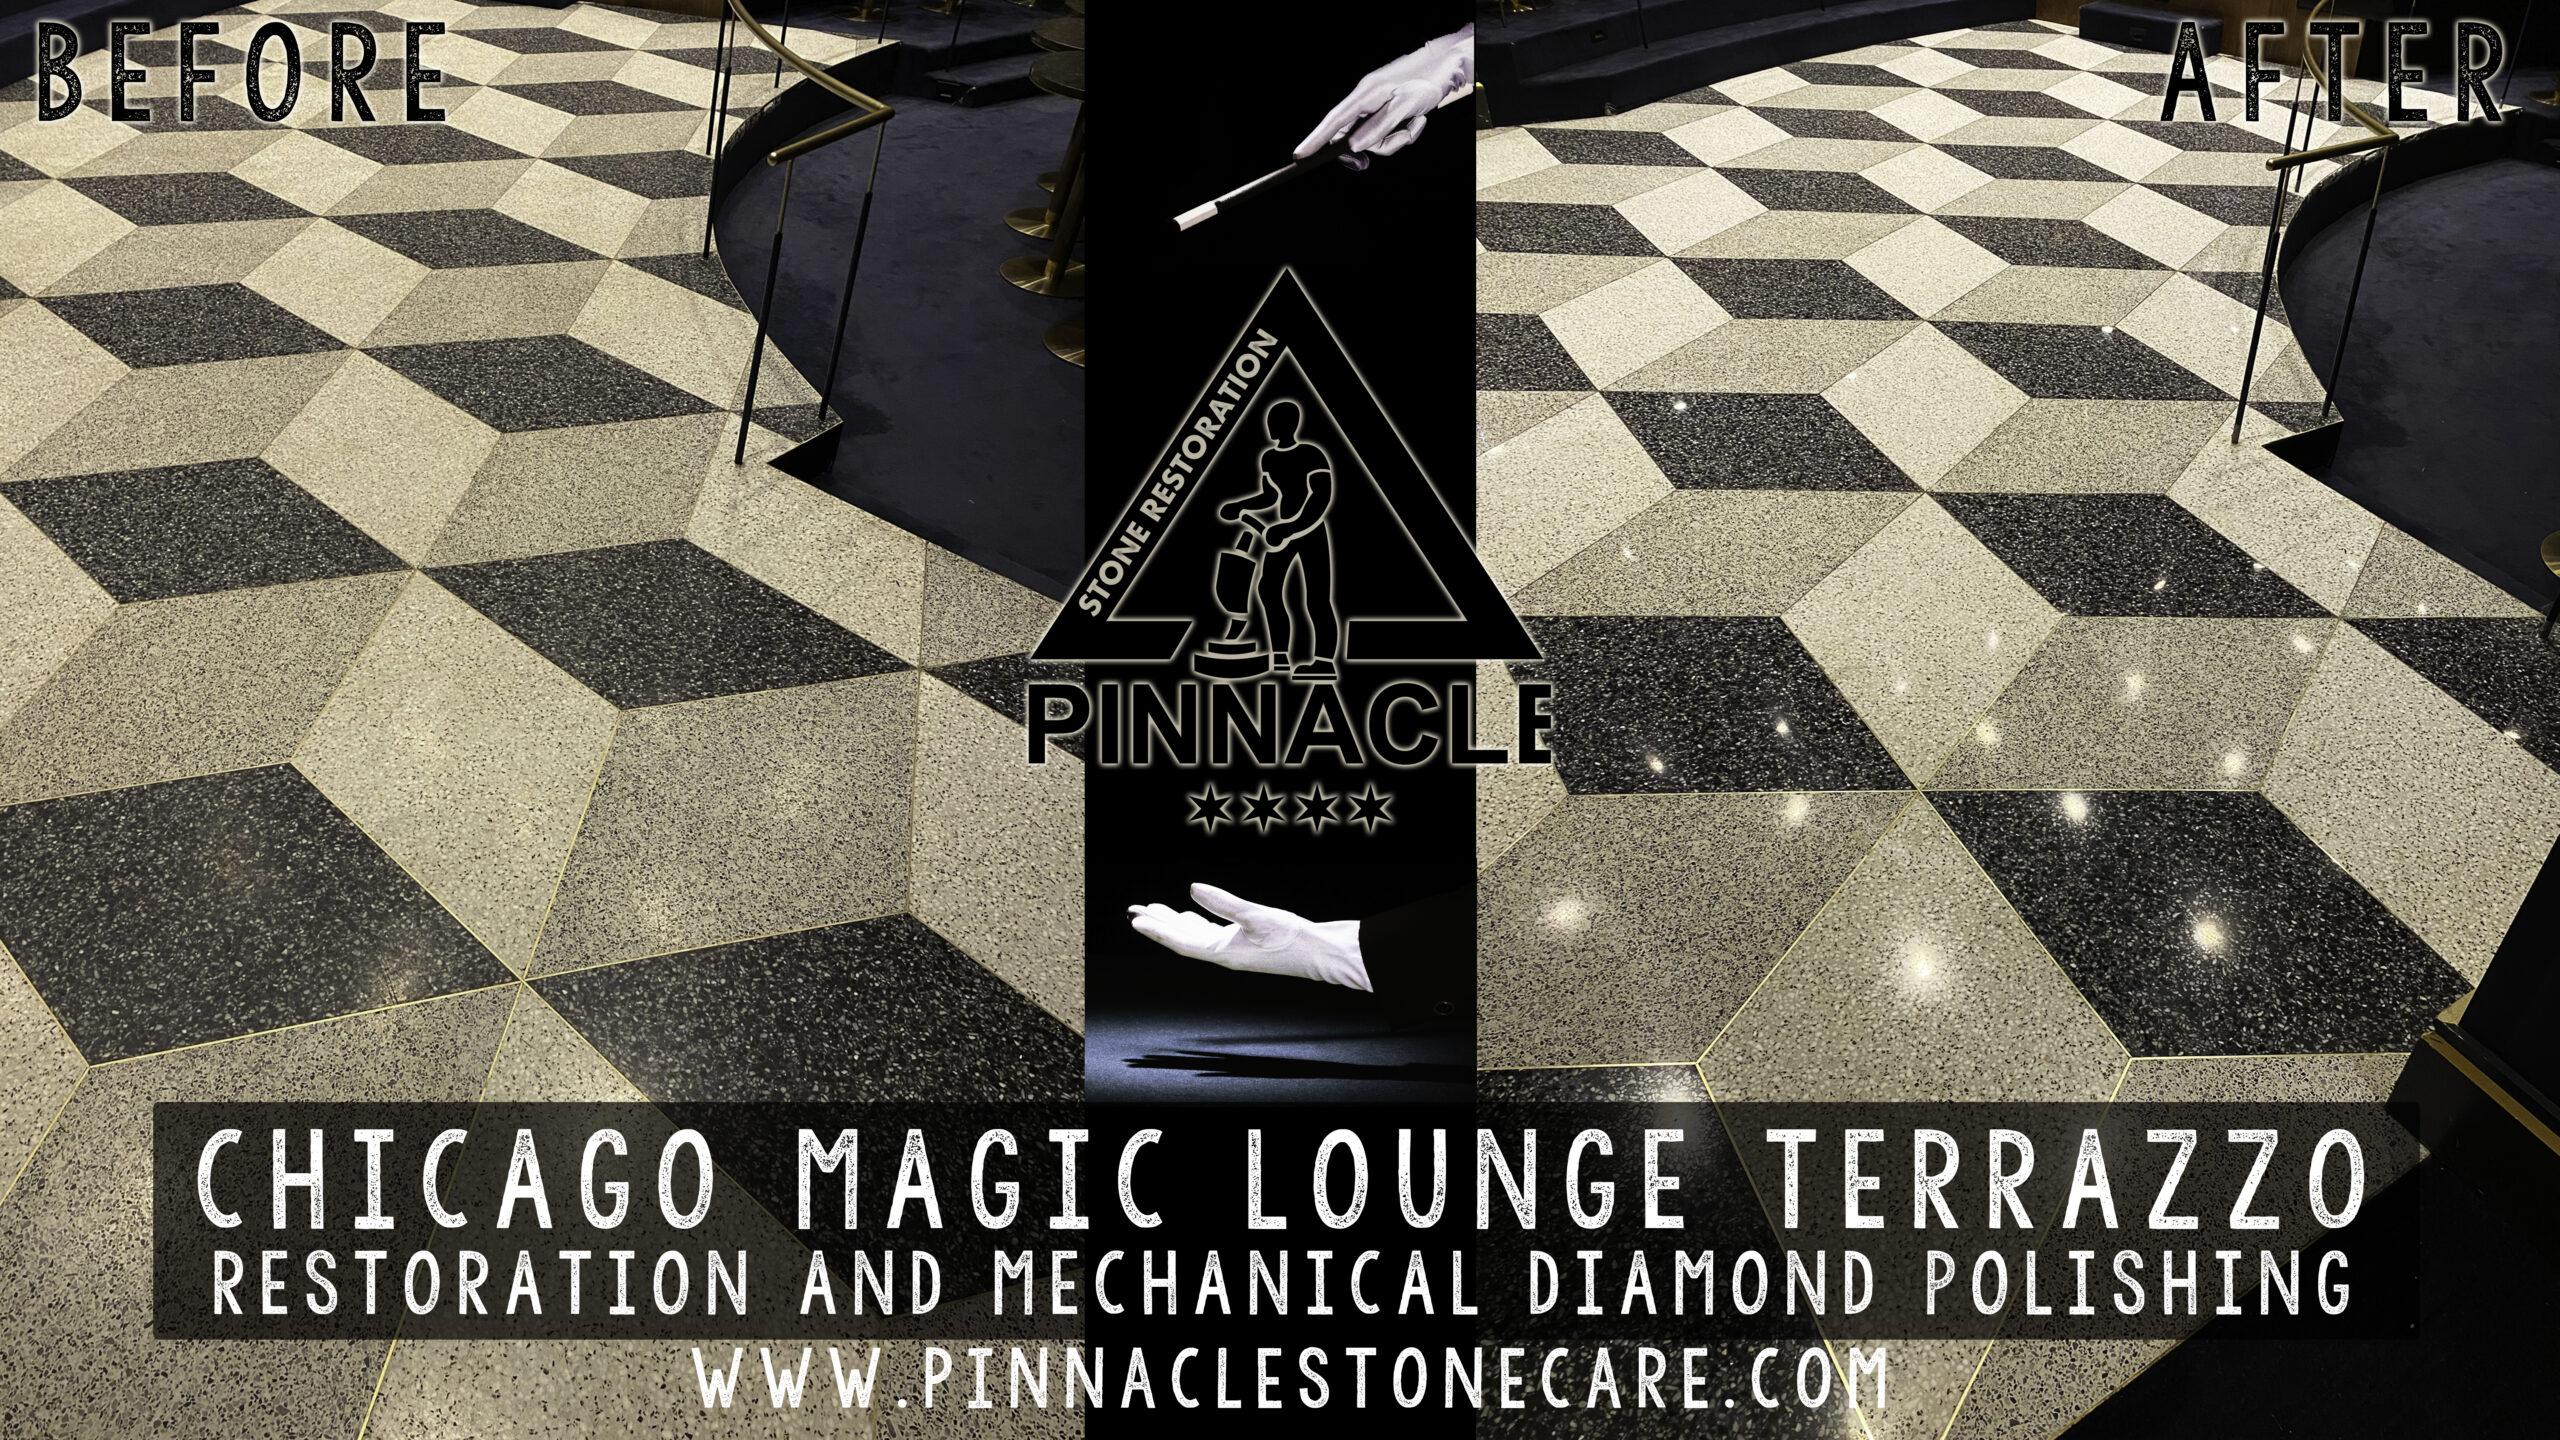 Chicago Magic Lounge terrazzo restoration and mechanical diamond polishing